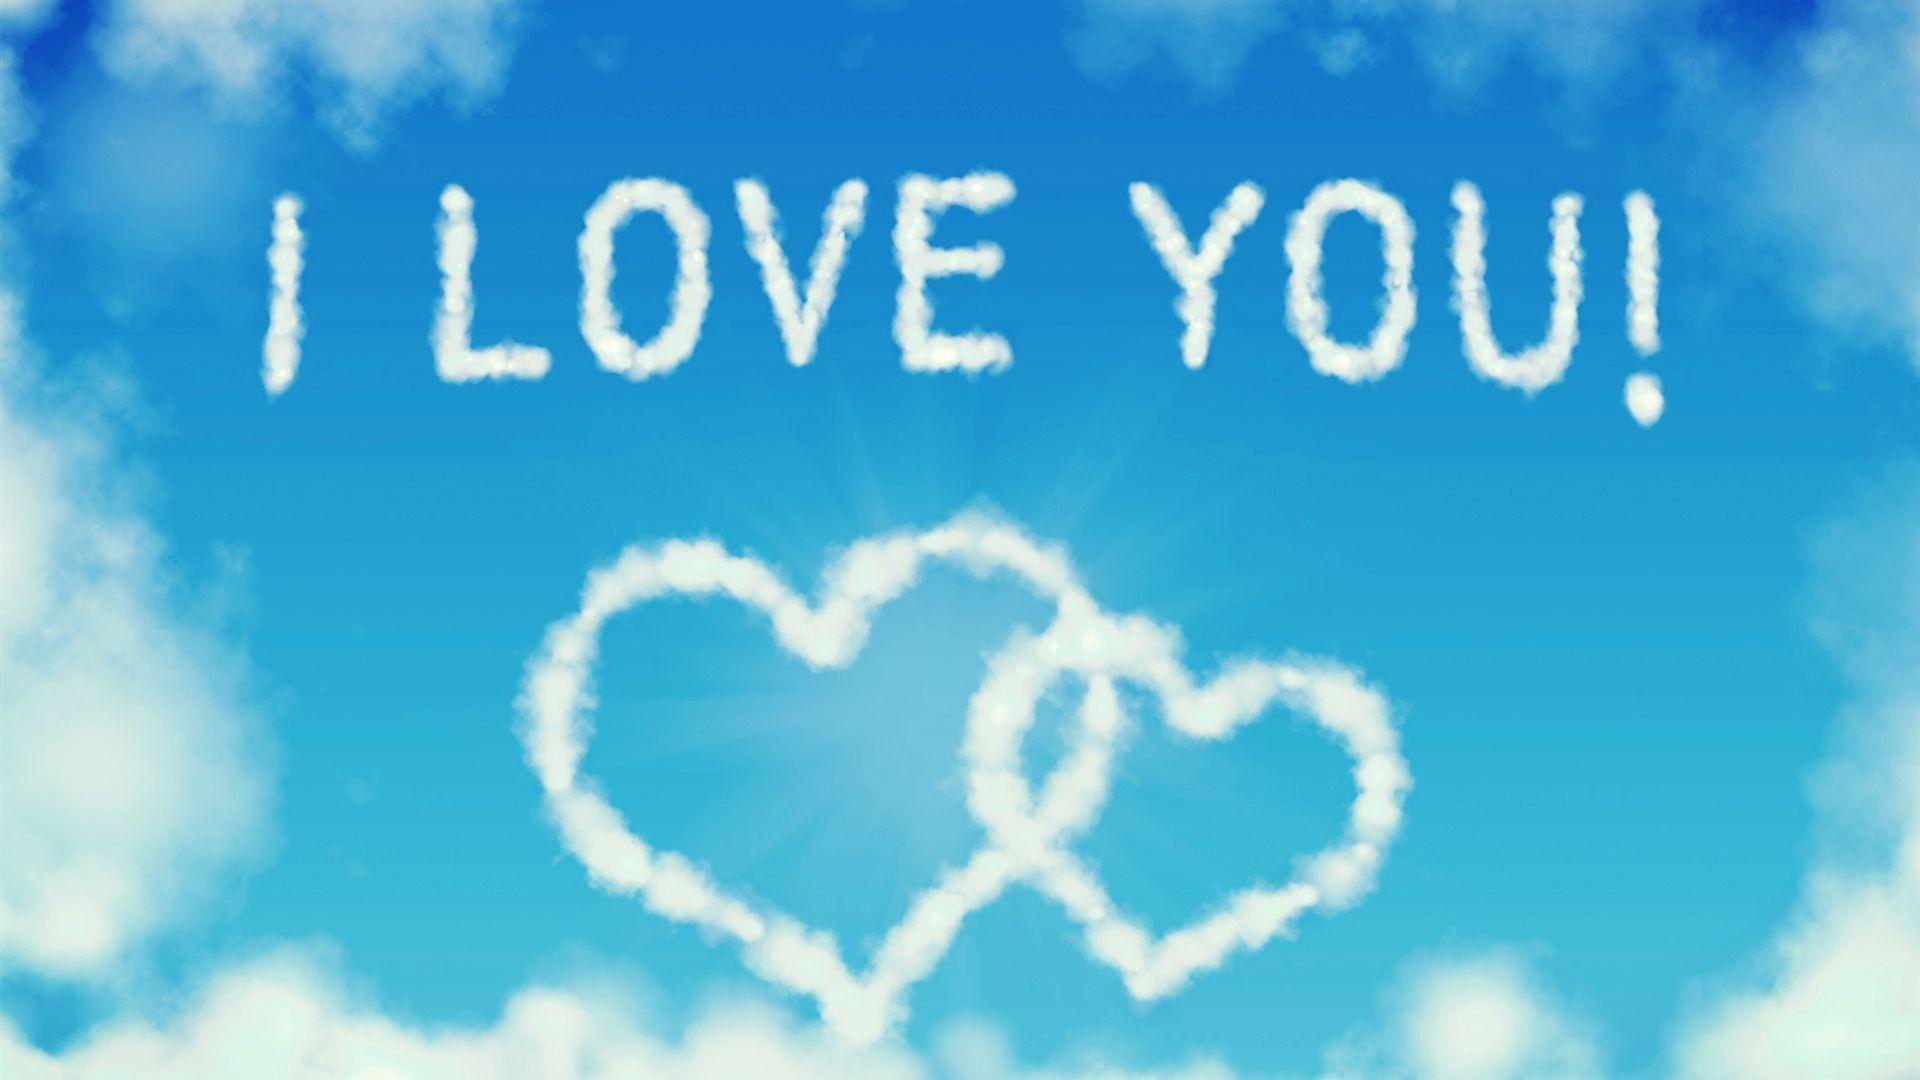 Download Wallpaper of love you HD Wallpaper of love you Download